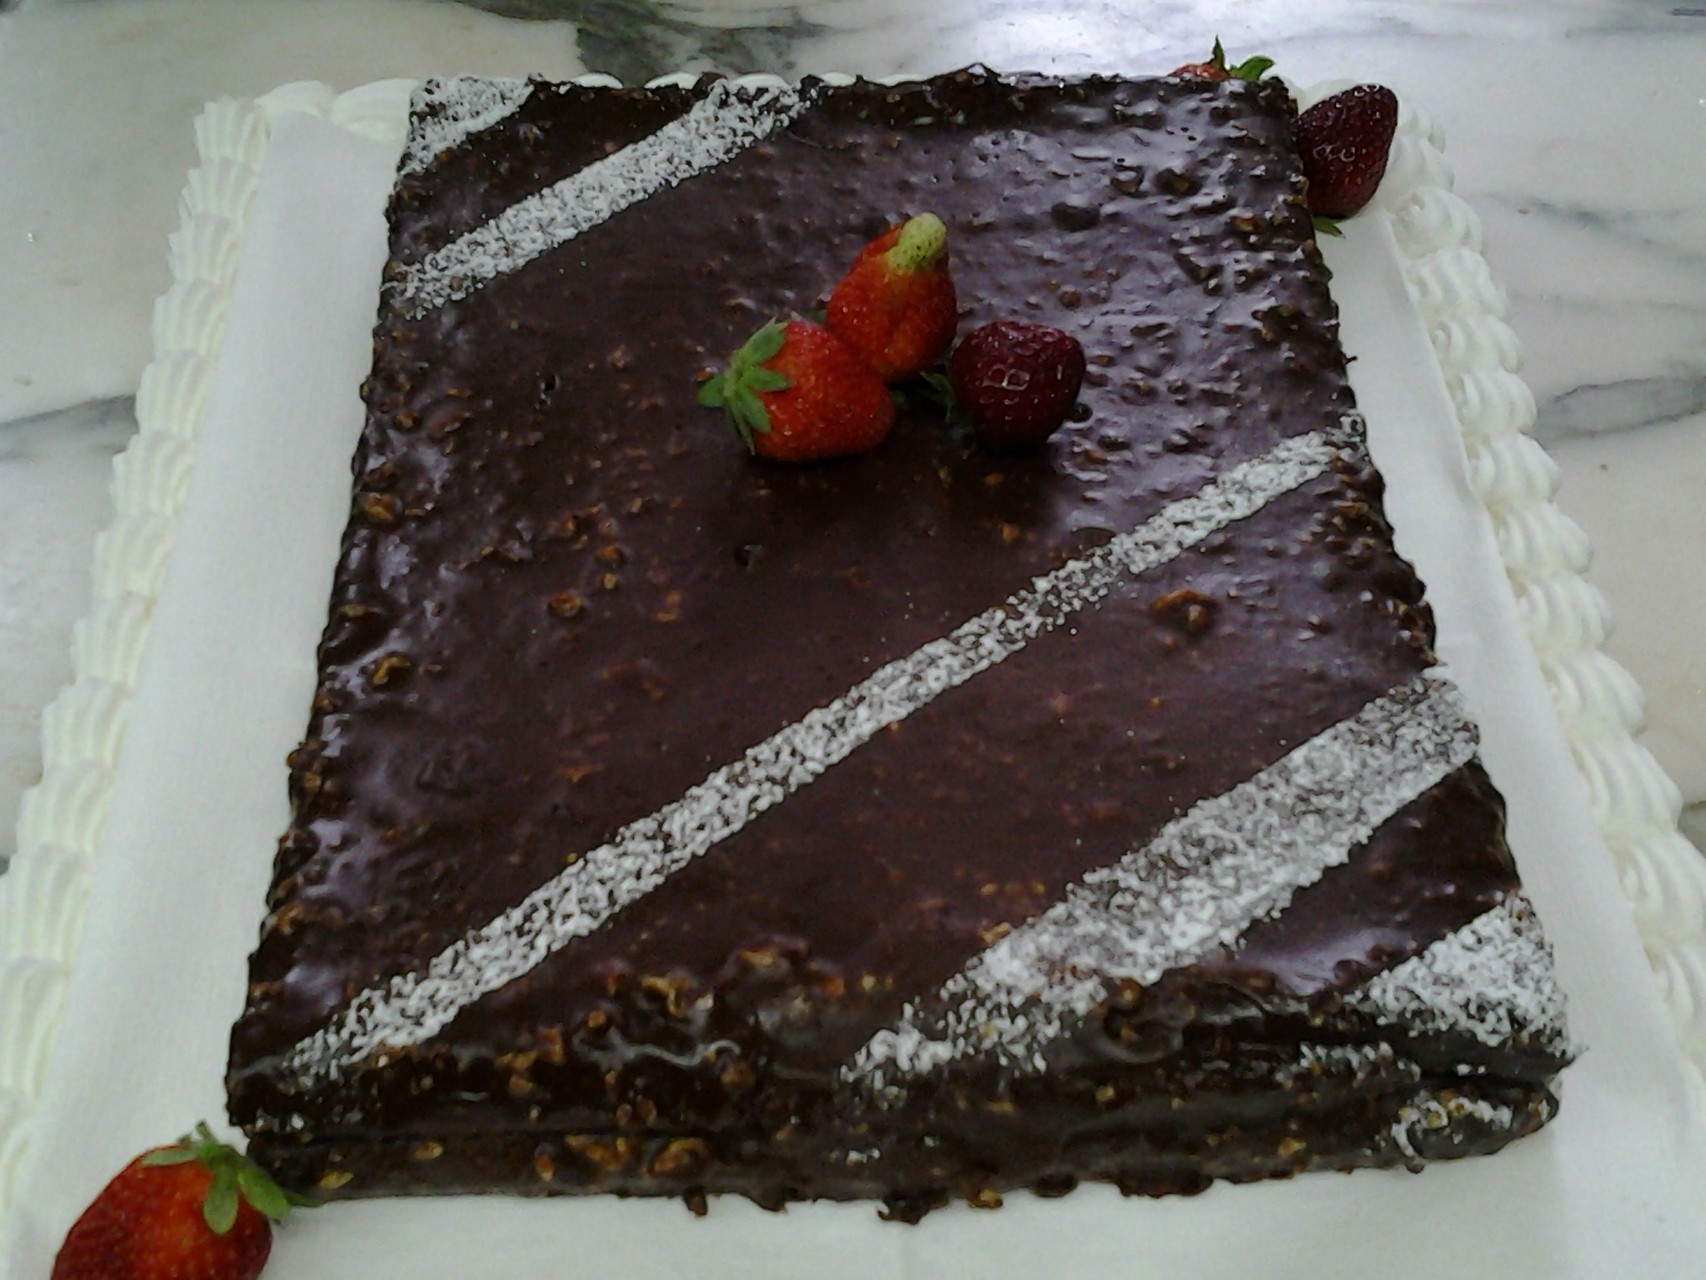 Tendresse chocolat noisette caramel au beurre salé